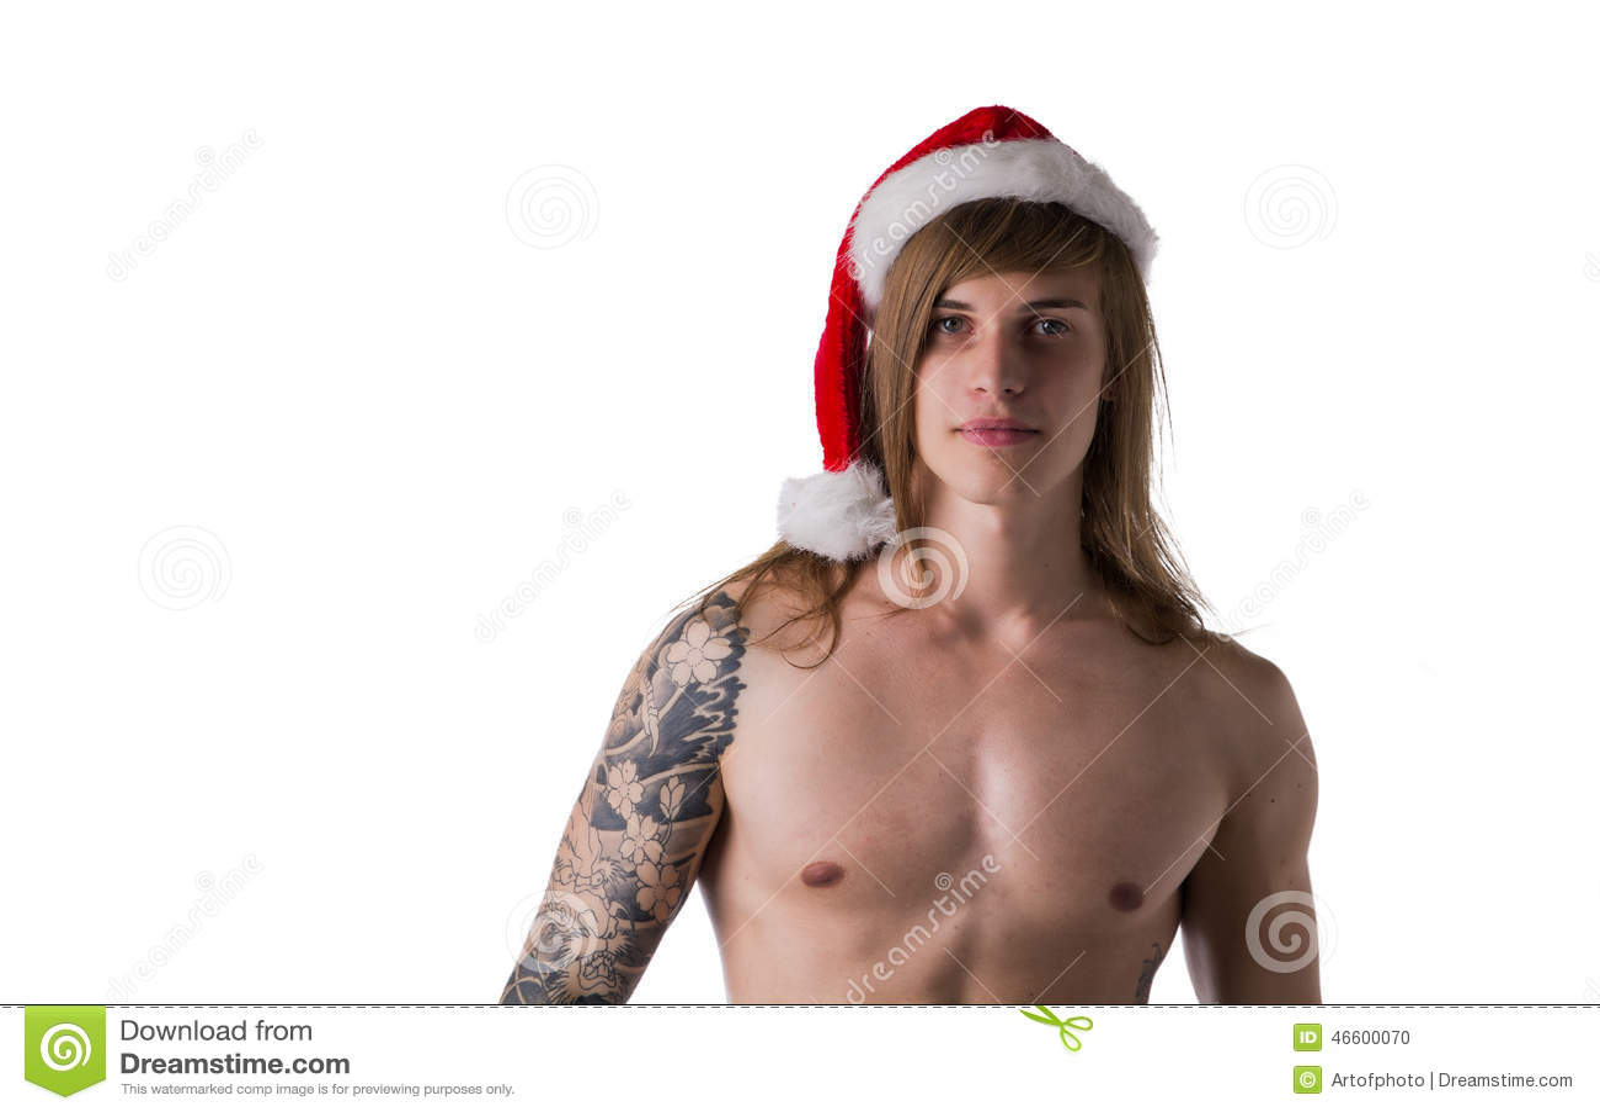 handsome shirtless young man wearing red santa claus hat Bernie Sanders Vector Cartoon Vector